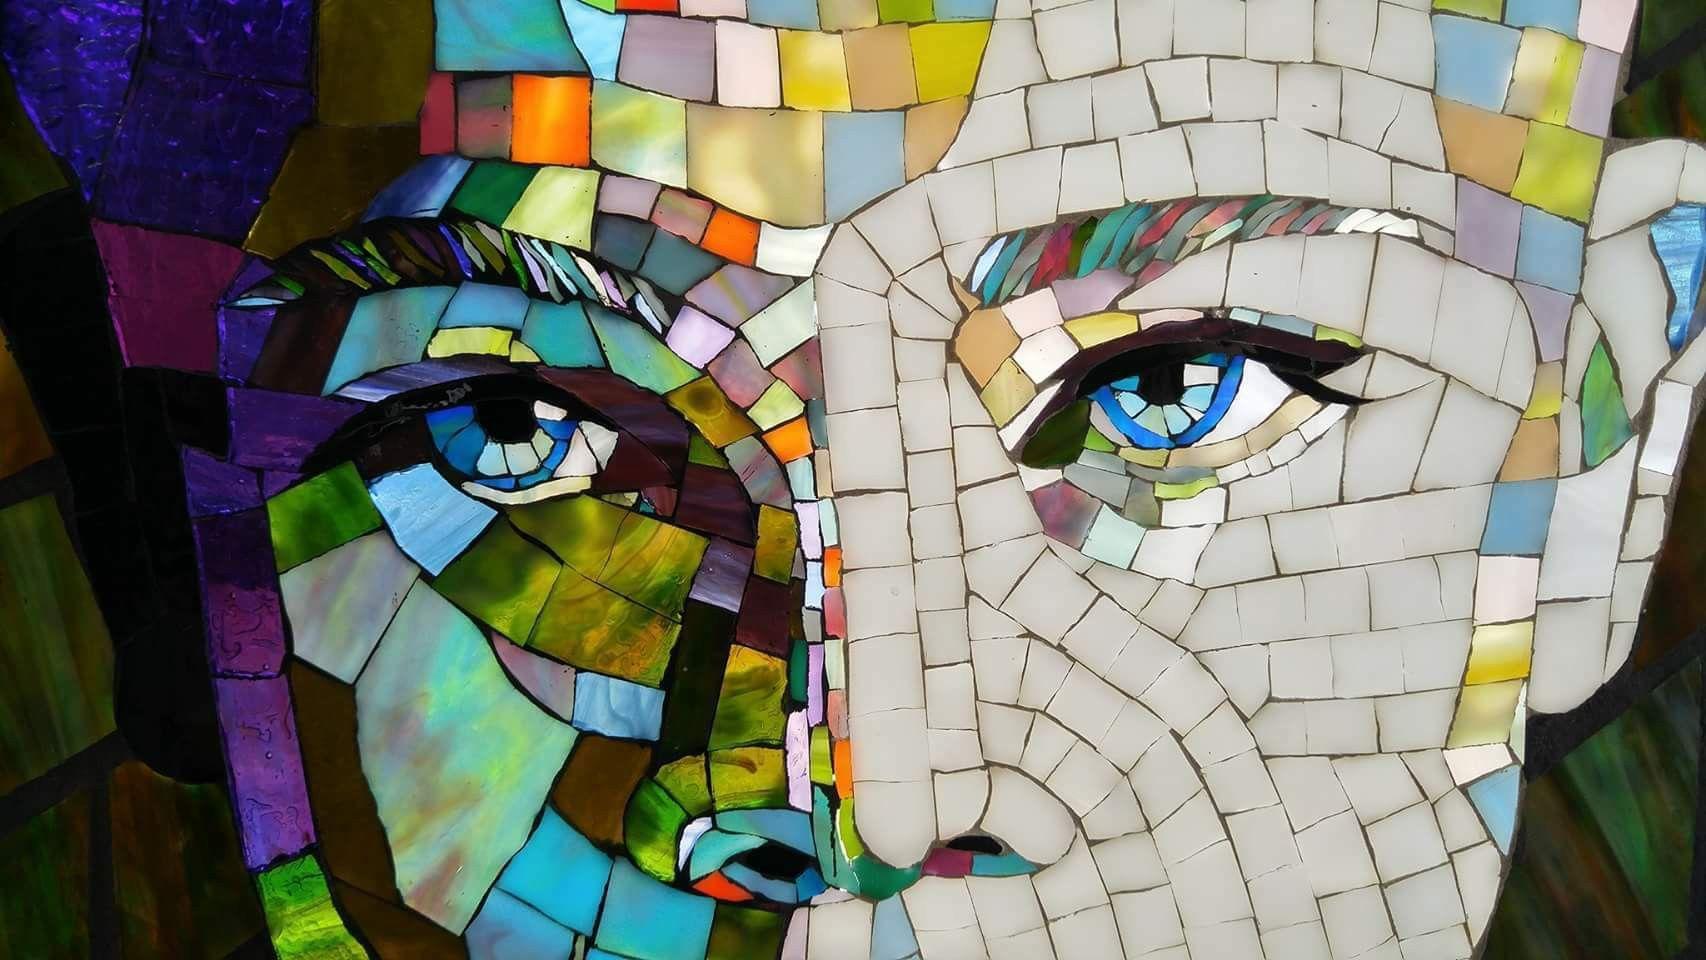 Pin De Mar V En Mosaicos Mosaicos Rostros Caras